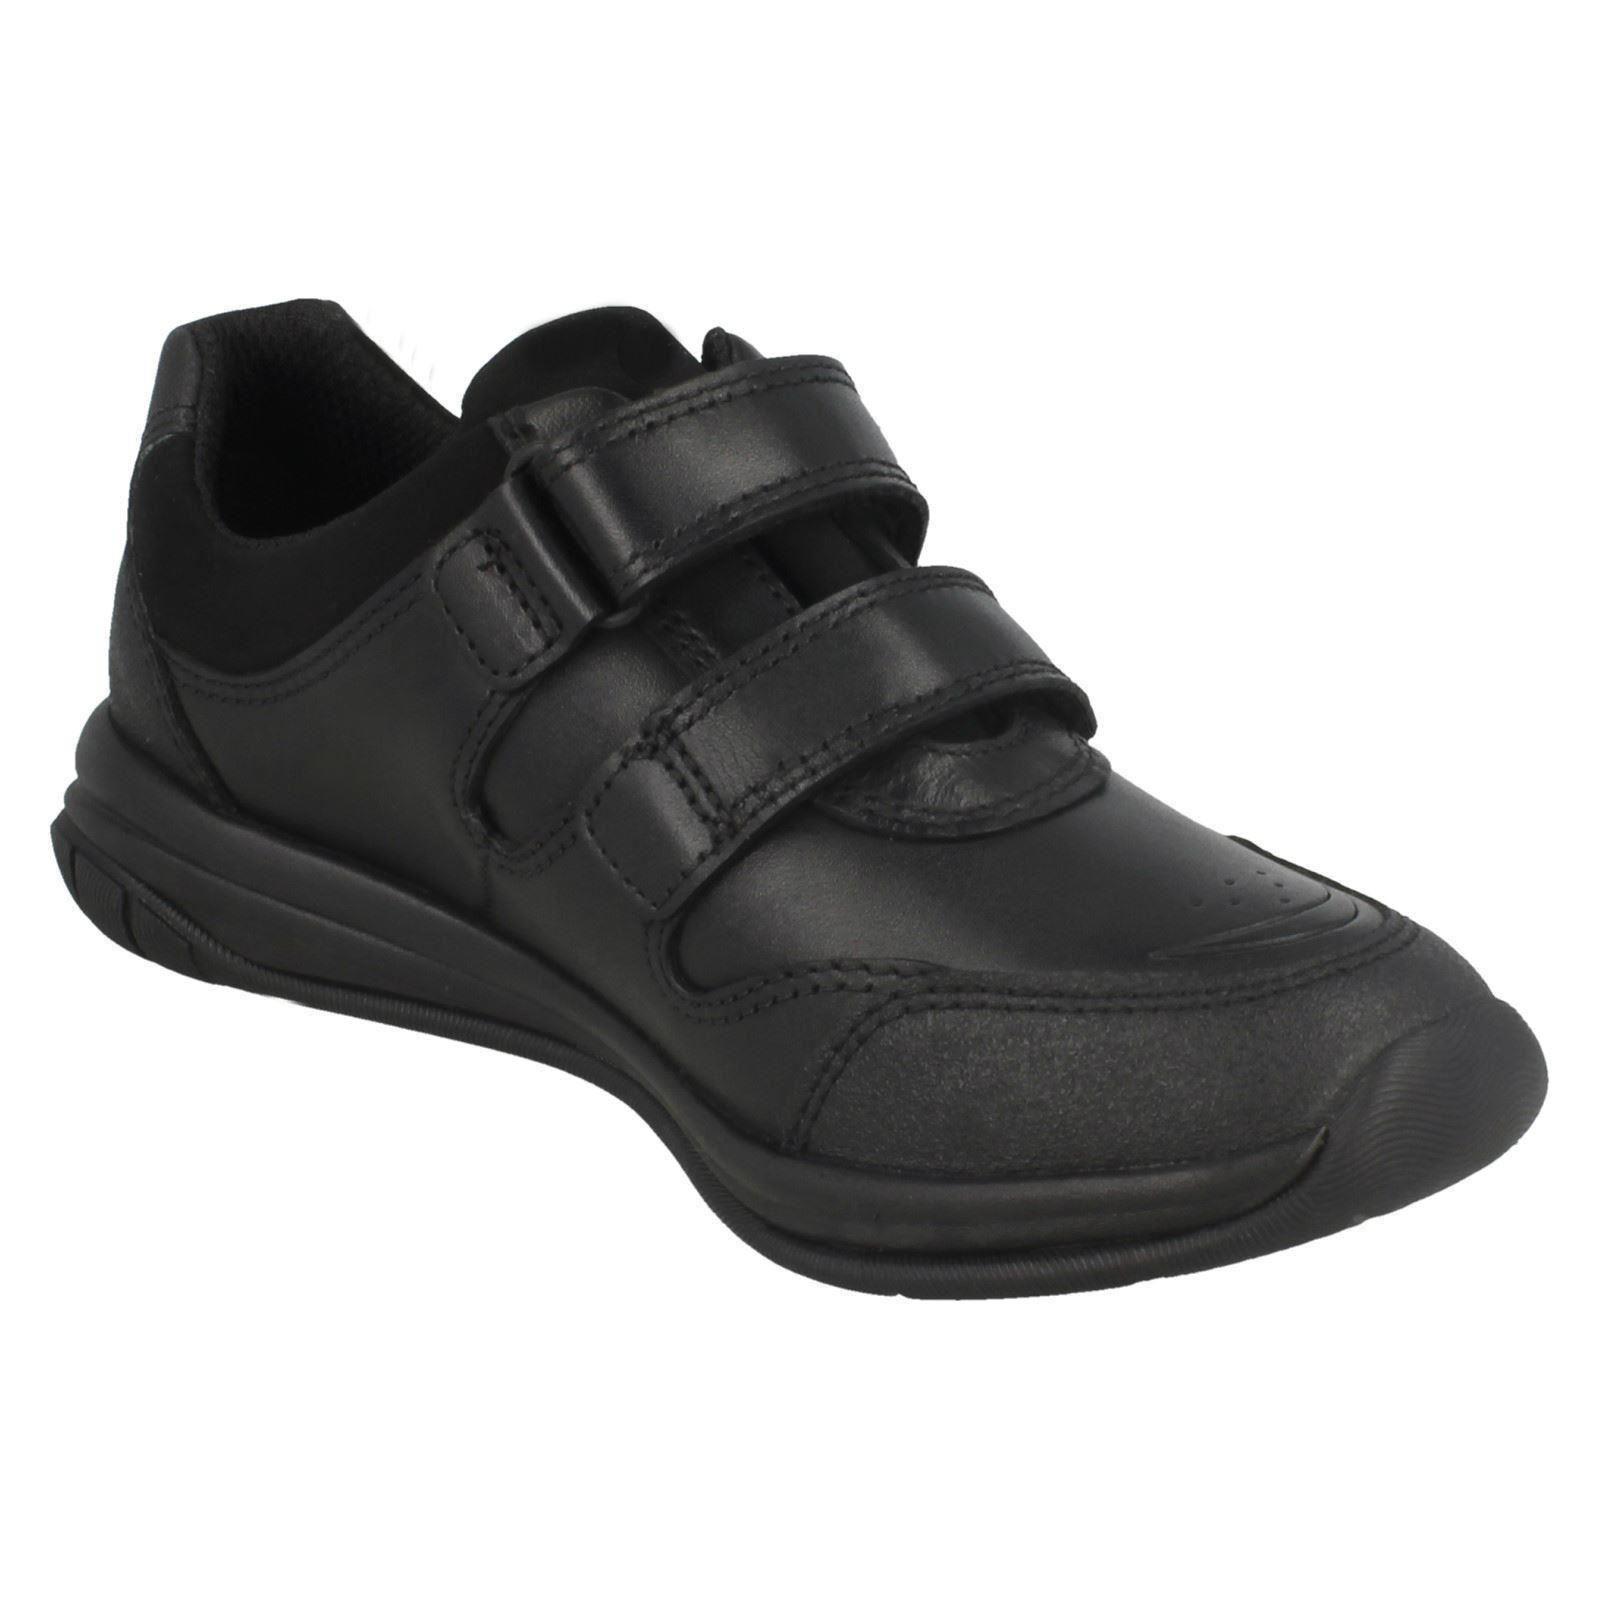 Boys Clarks Gore-Tex Casual School Shoes Hula Go